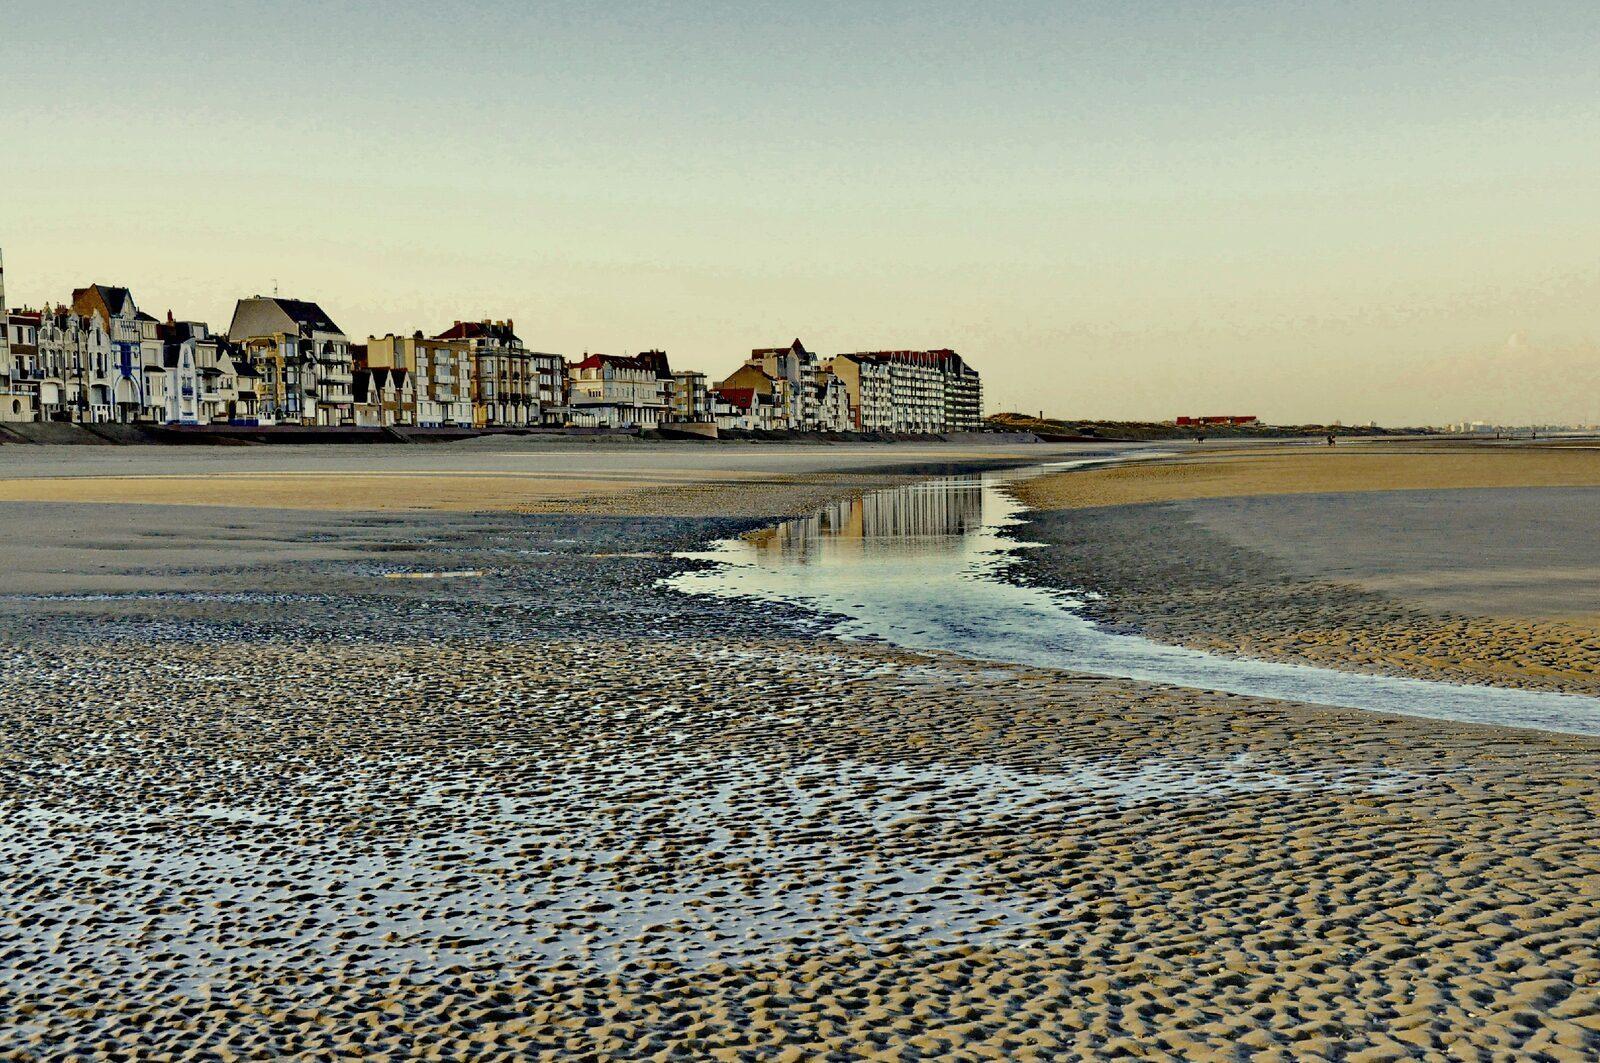 Bray-Dunes beach